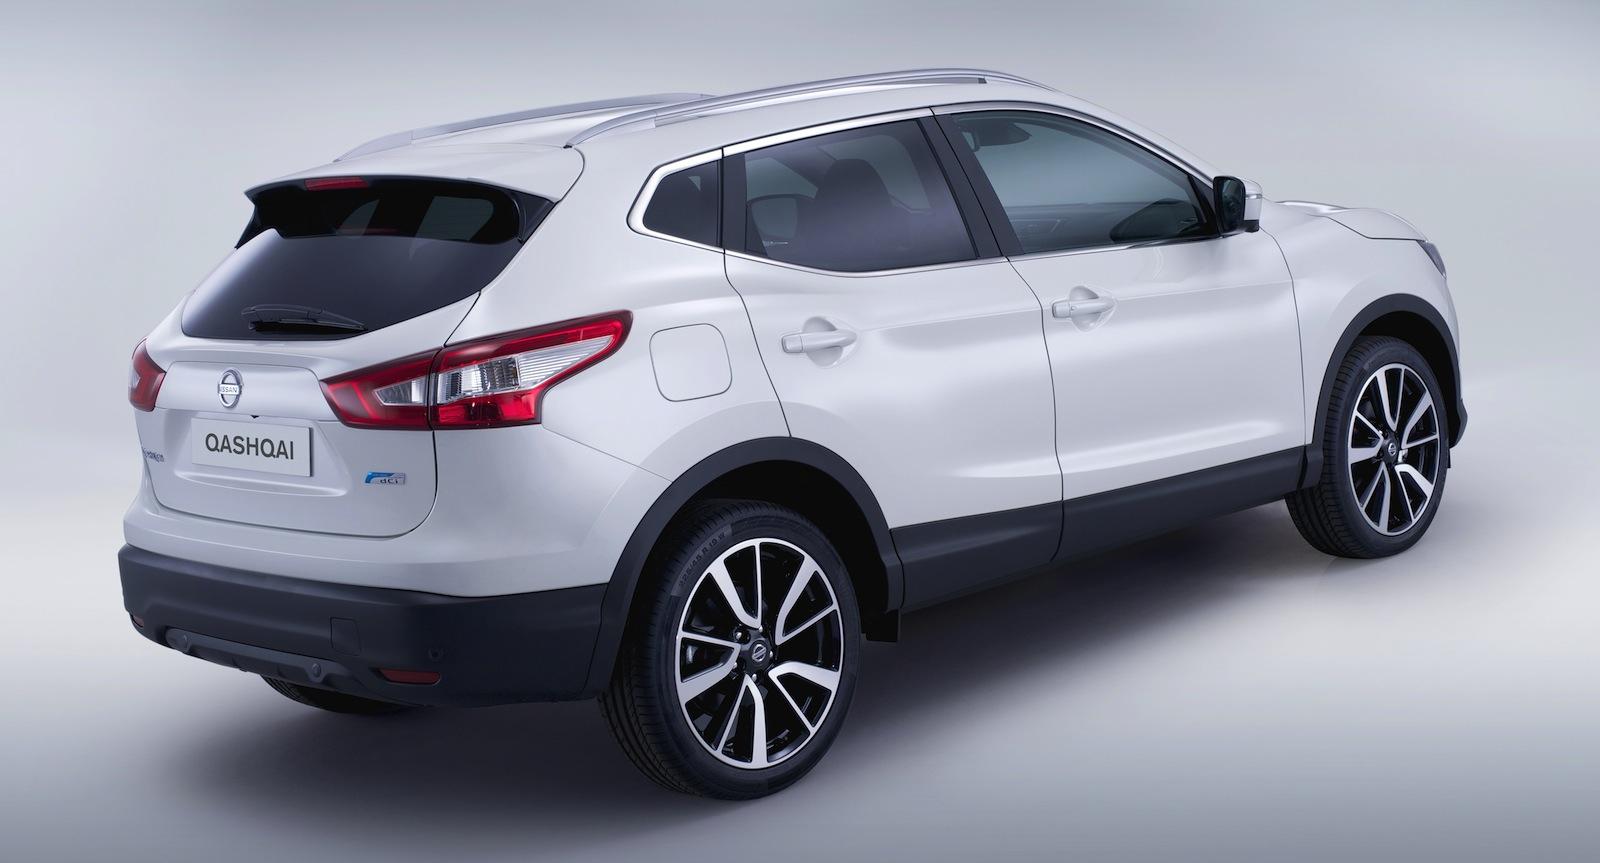 Nissan Qashqai Usa >> Nissan Qashqai Pricing And Specifications Caradvice